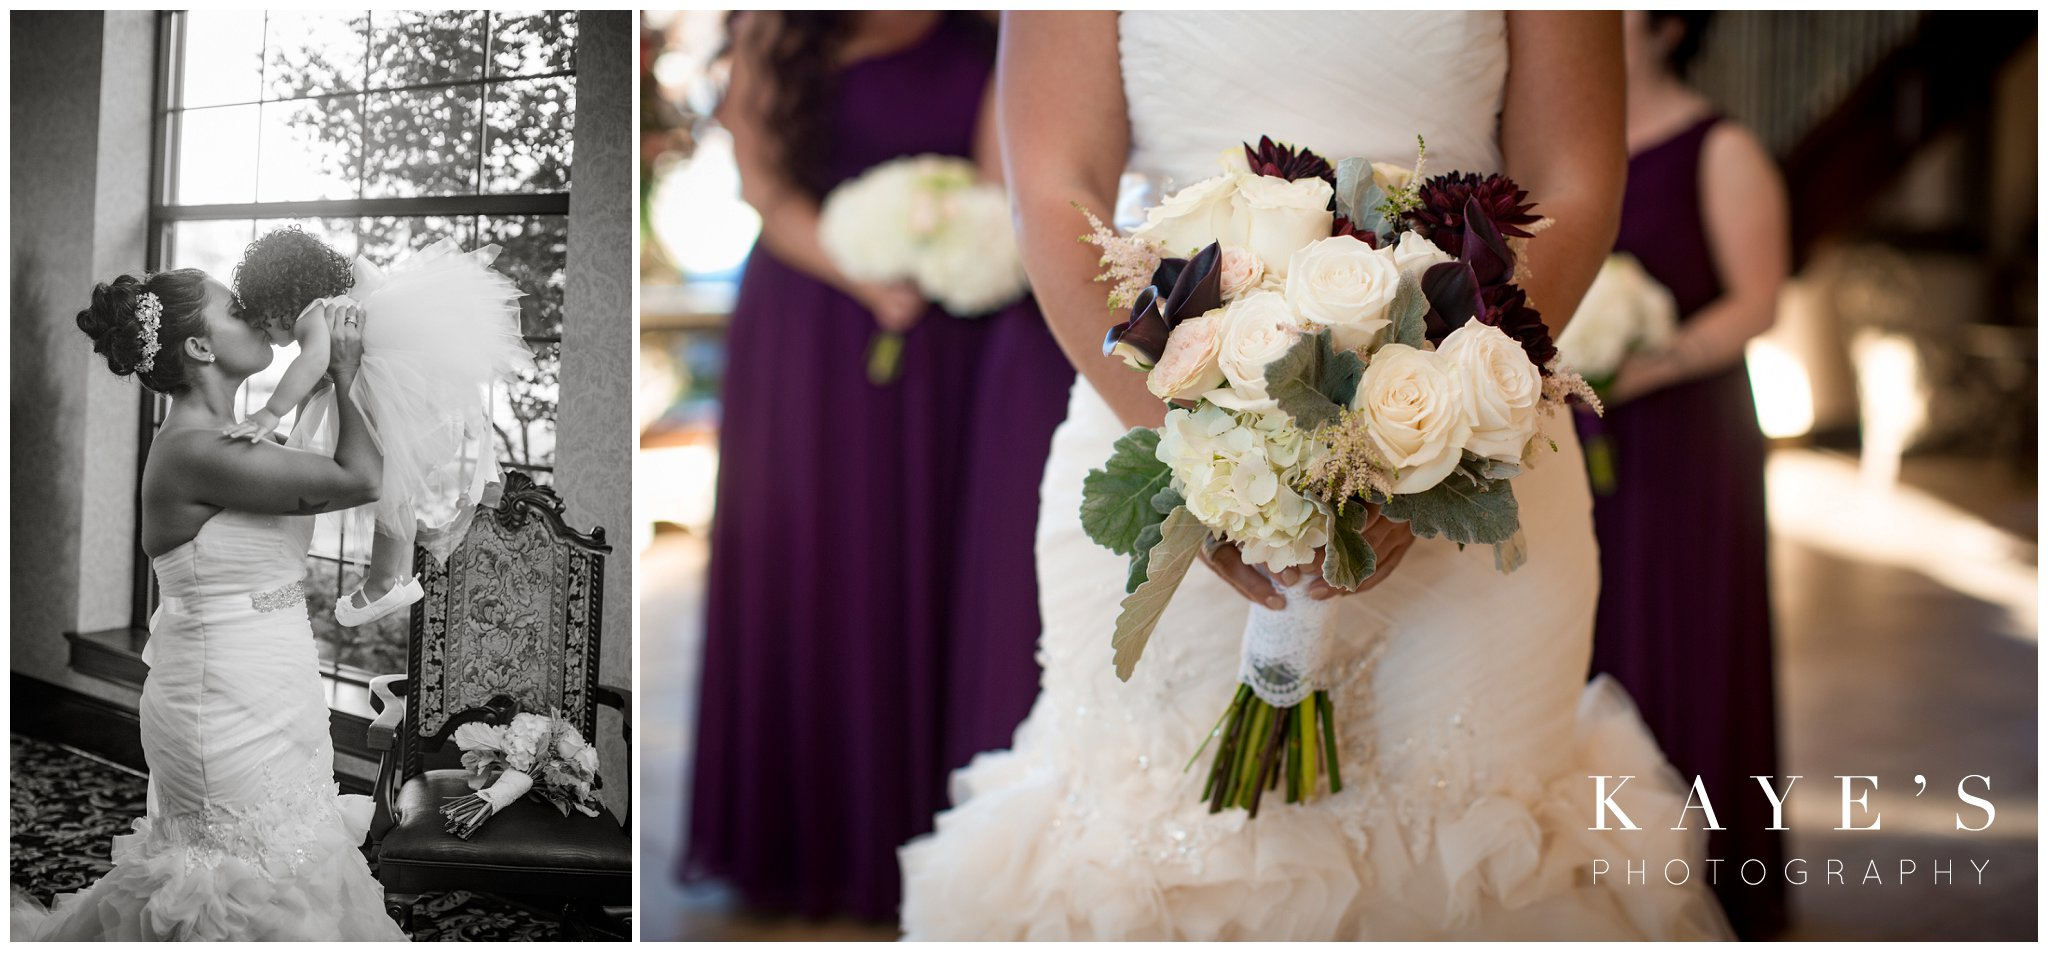 Kayes Photography- howell-michigan-wedding-photographer_0648.jpg